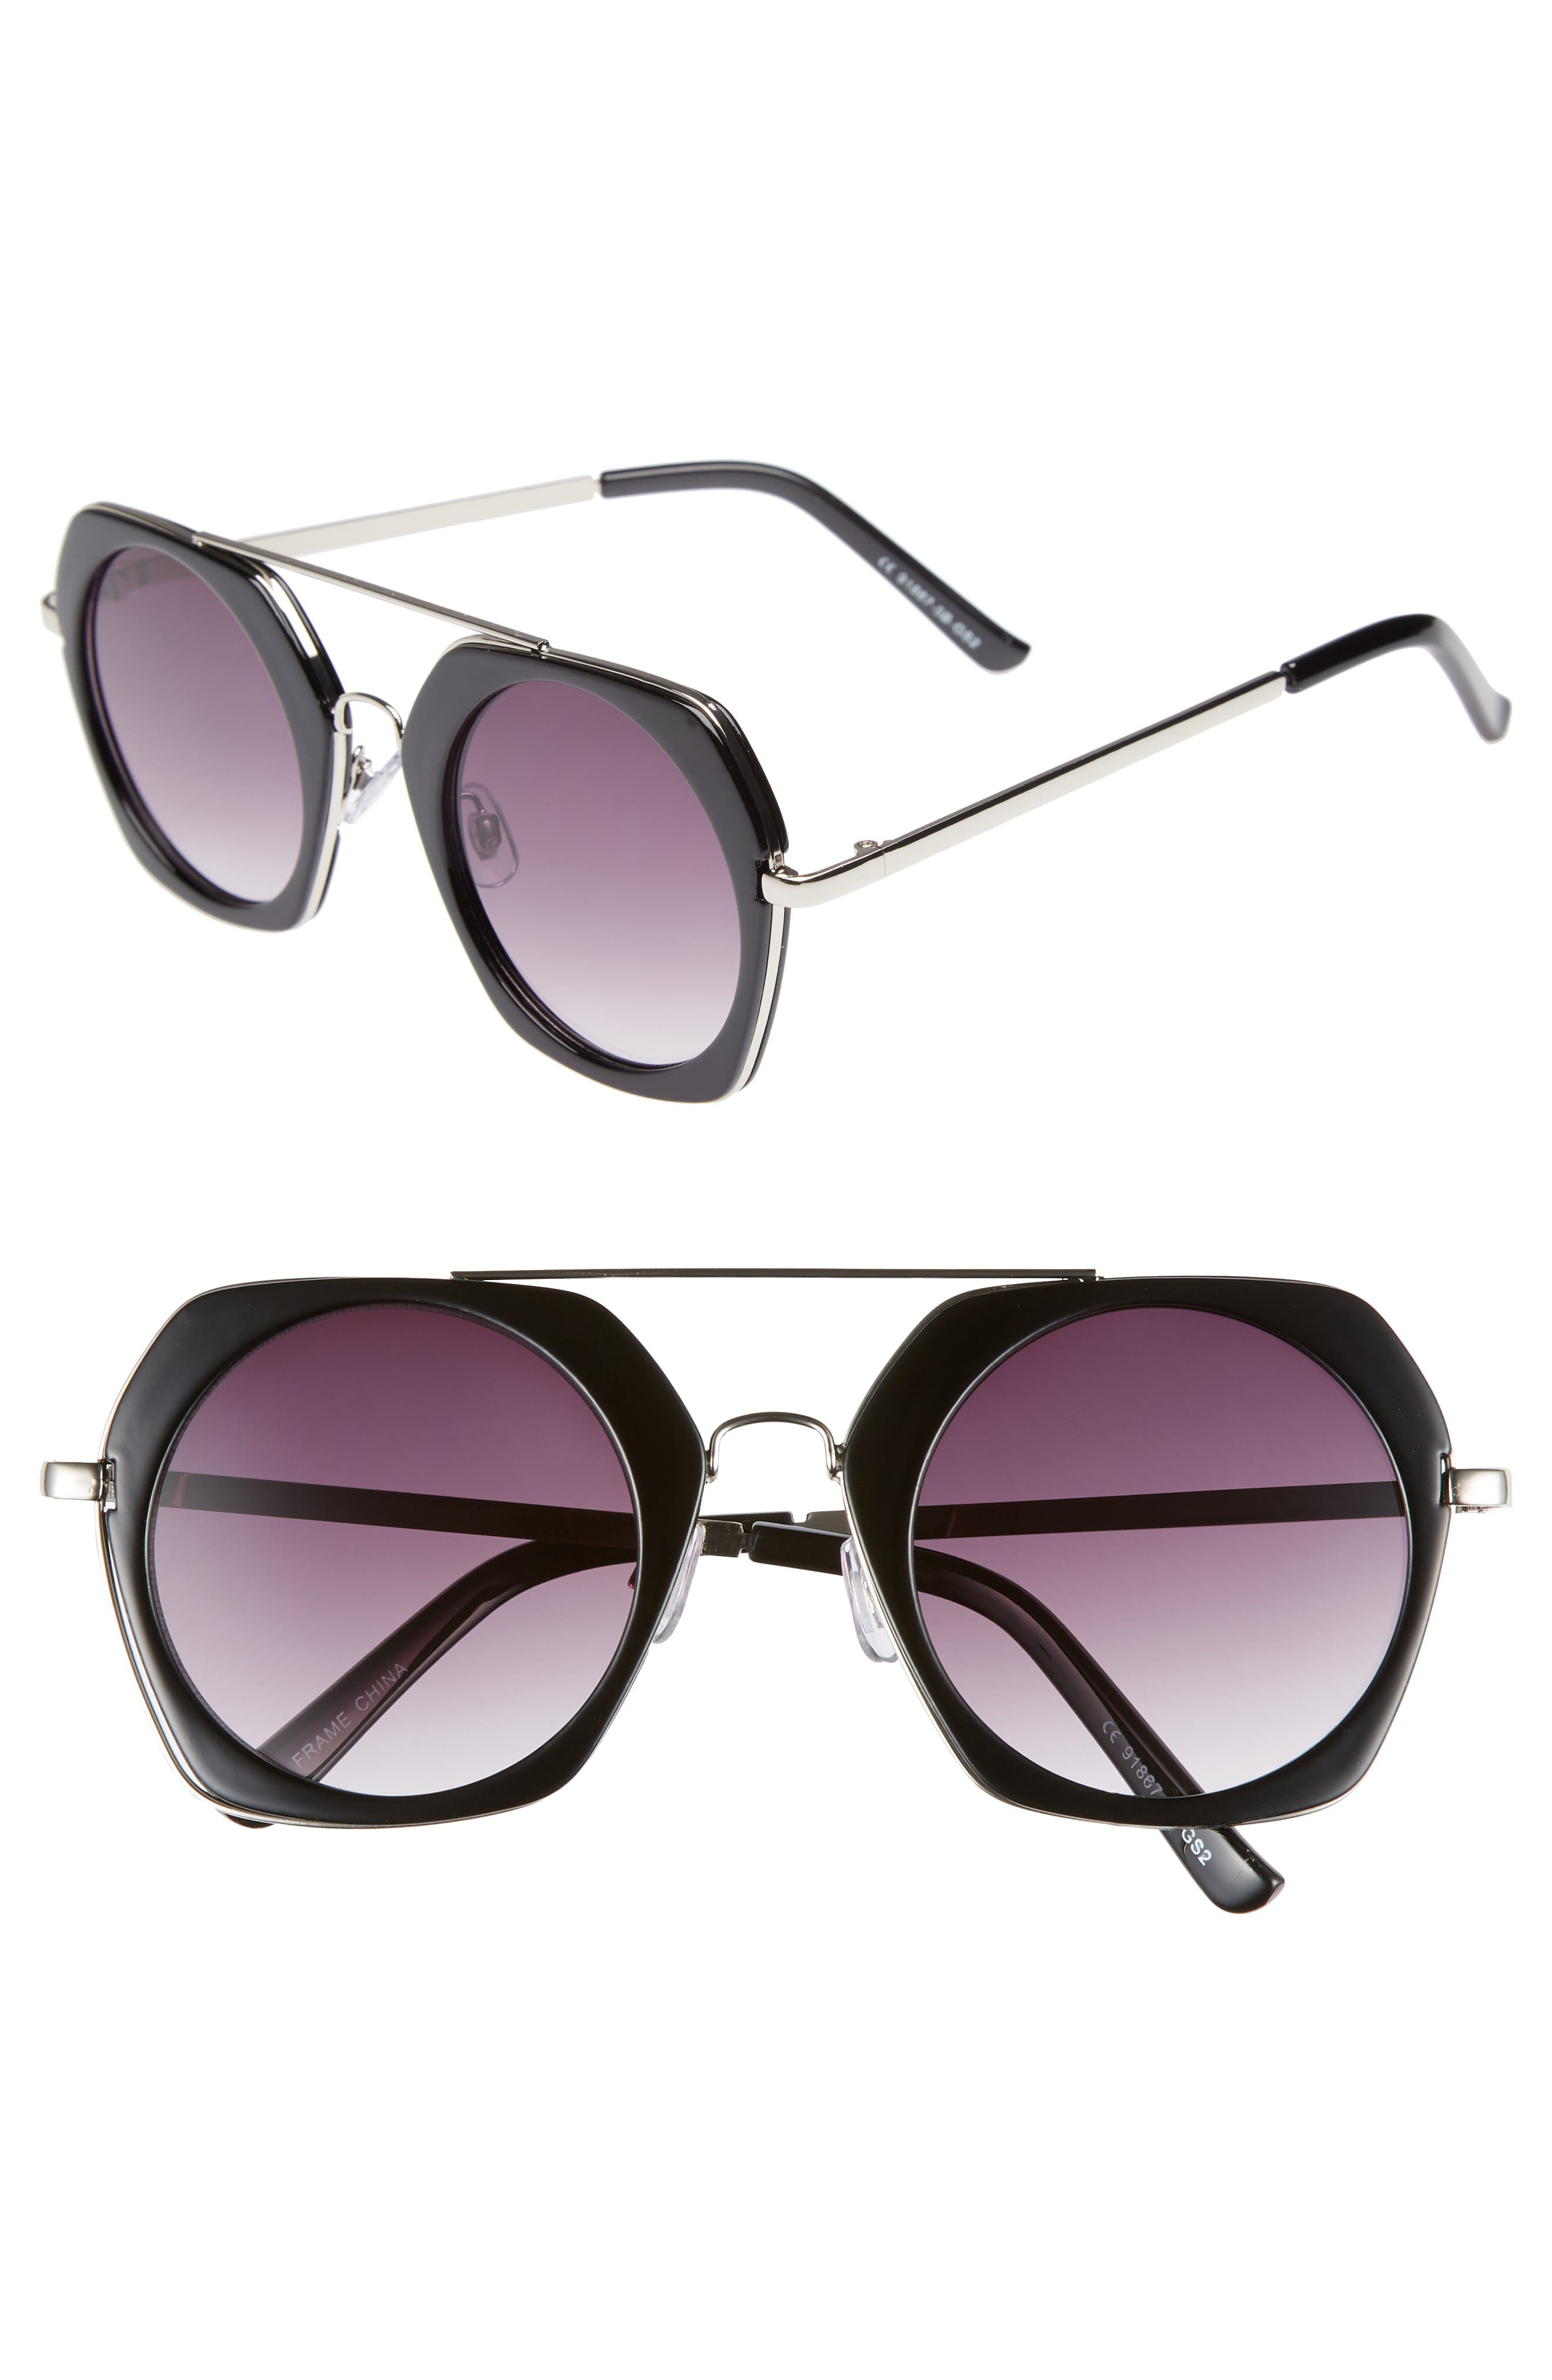 50mm Geometric Aviator Sunglasses,                         Main,                         color, BLACK